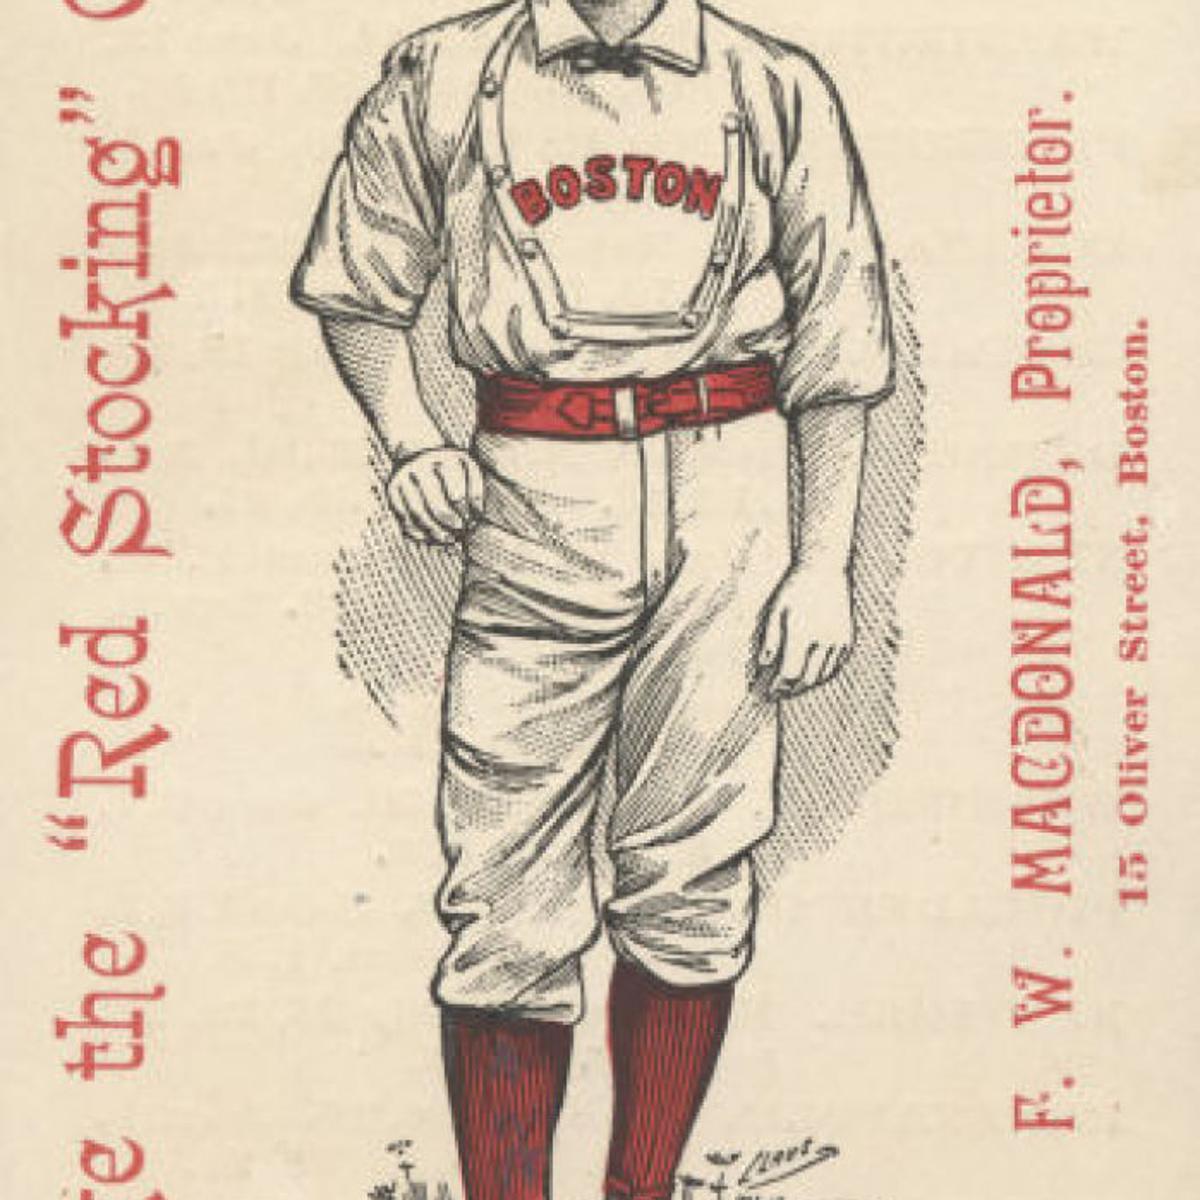 Old Hoss Radbourn Embodied Baseballs Coarser Past Local News